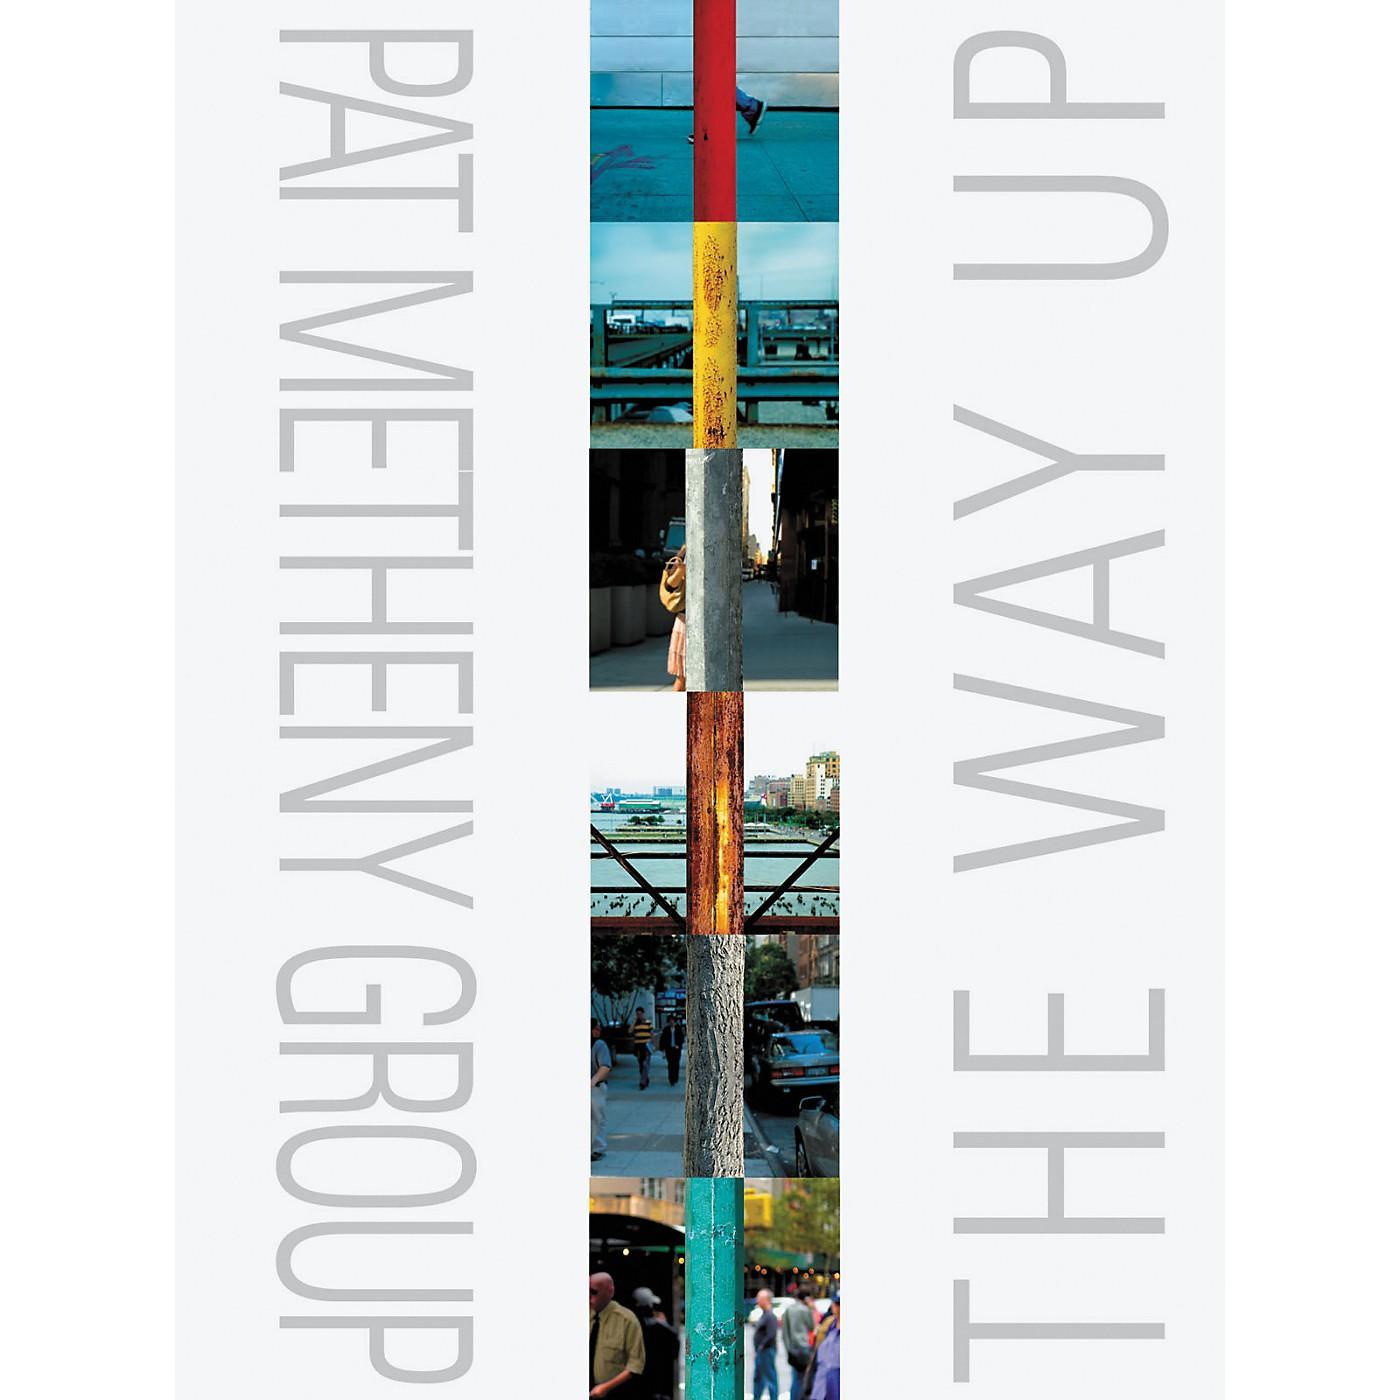 Hal Leonard Pat Metheny - The Way Up - Transcribed Score Book thumbnail